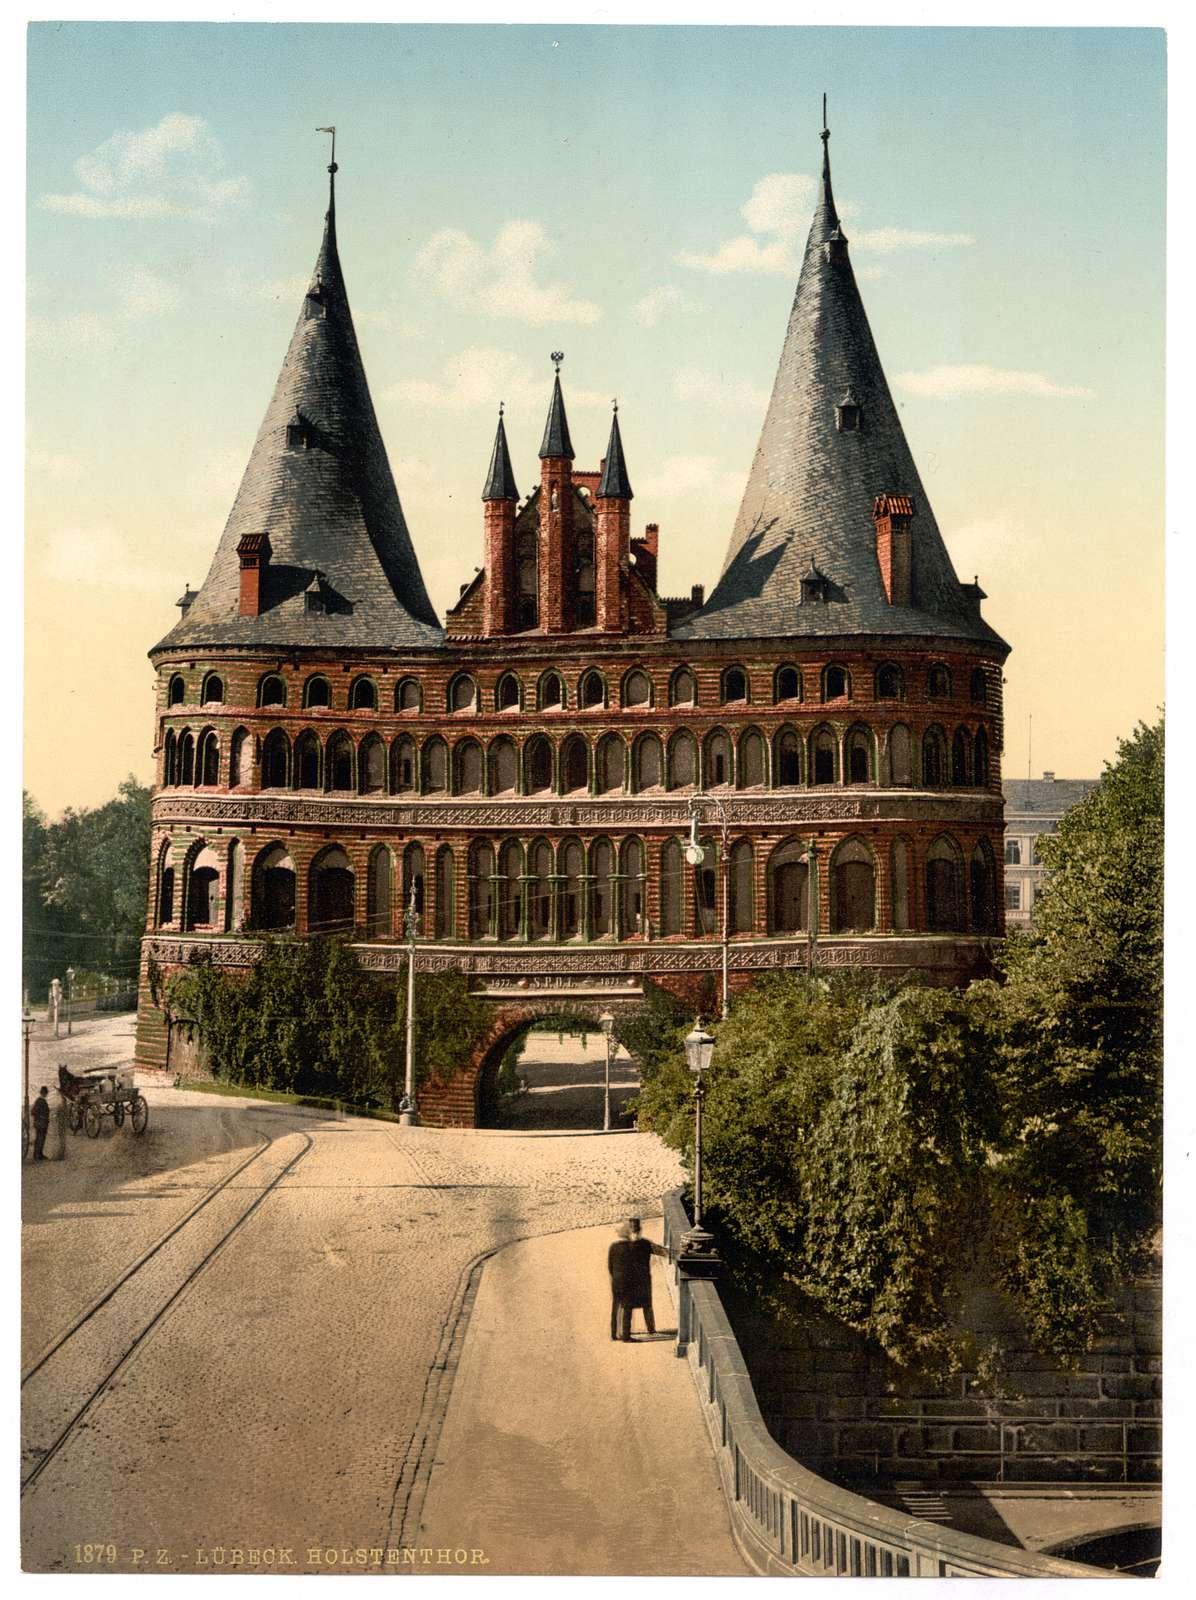 [Holstengate, Lubeck, Germany]